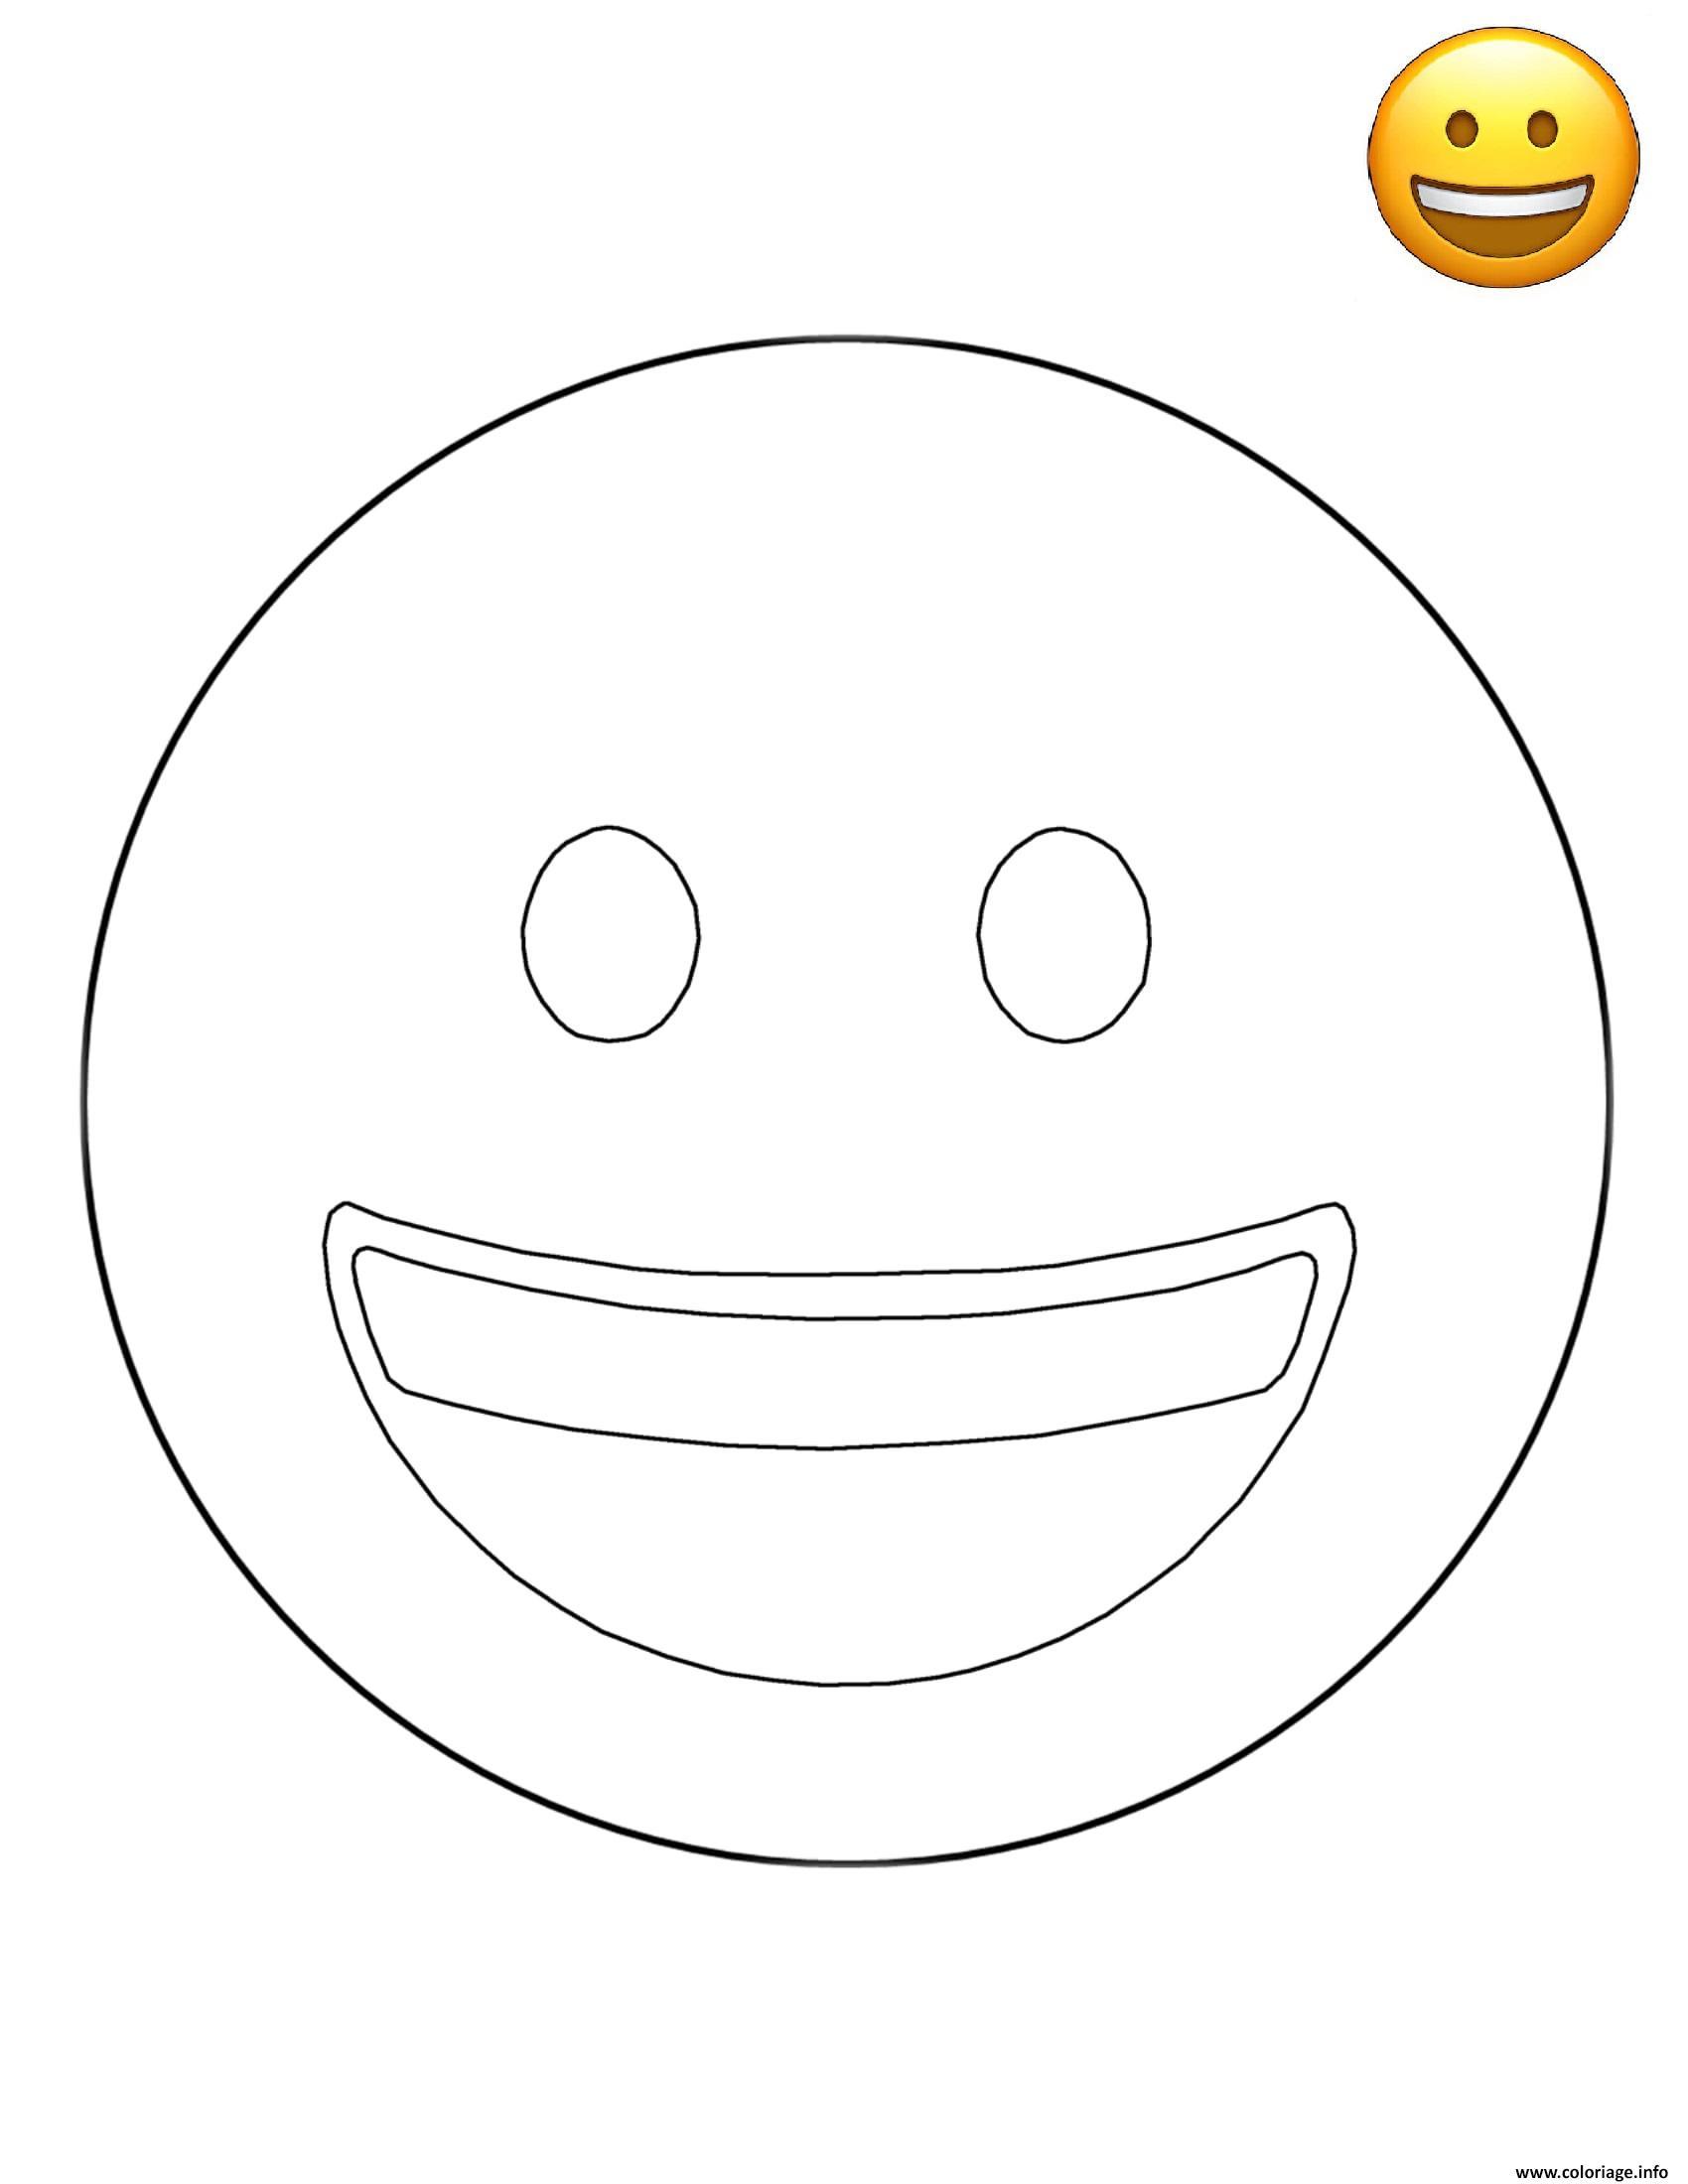 Coloriage Emoji Smiling Face Smiley Jecolorie Com